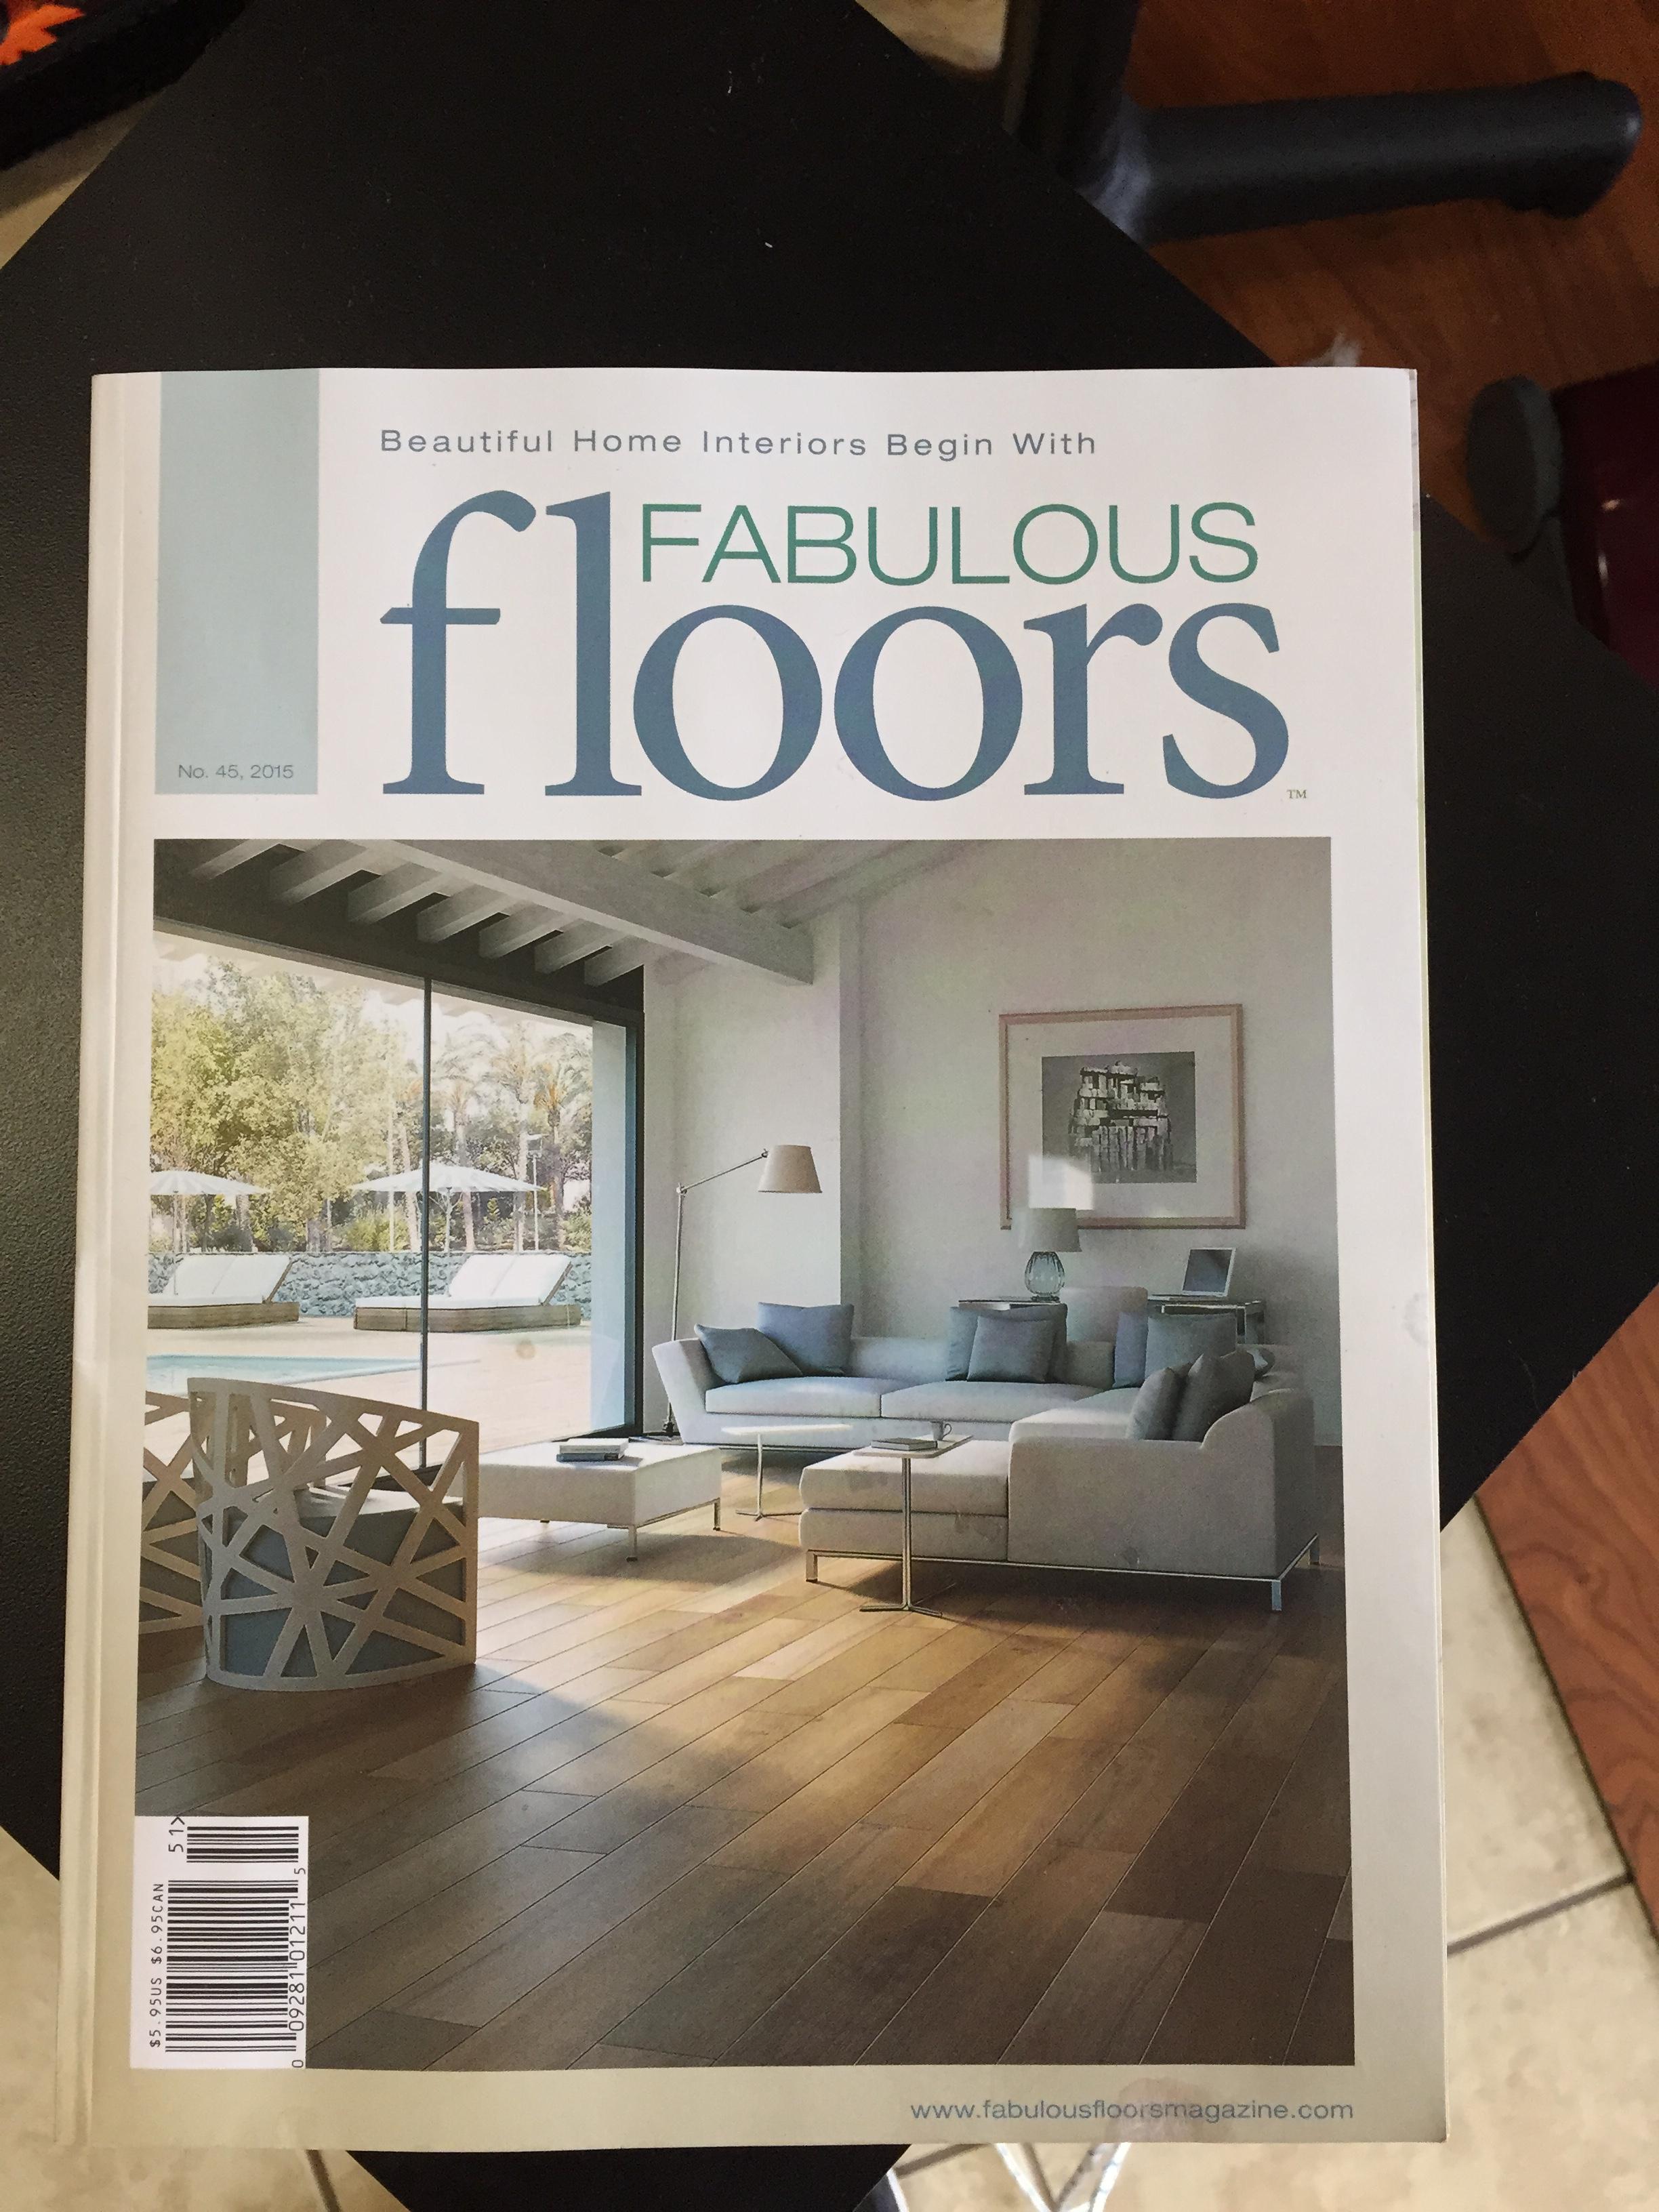 FabulousFloorsMagazine.jpg